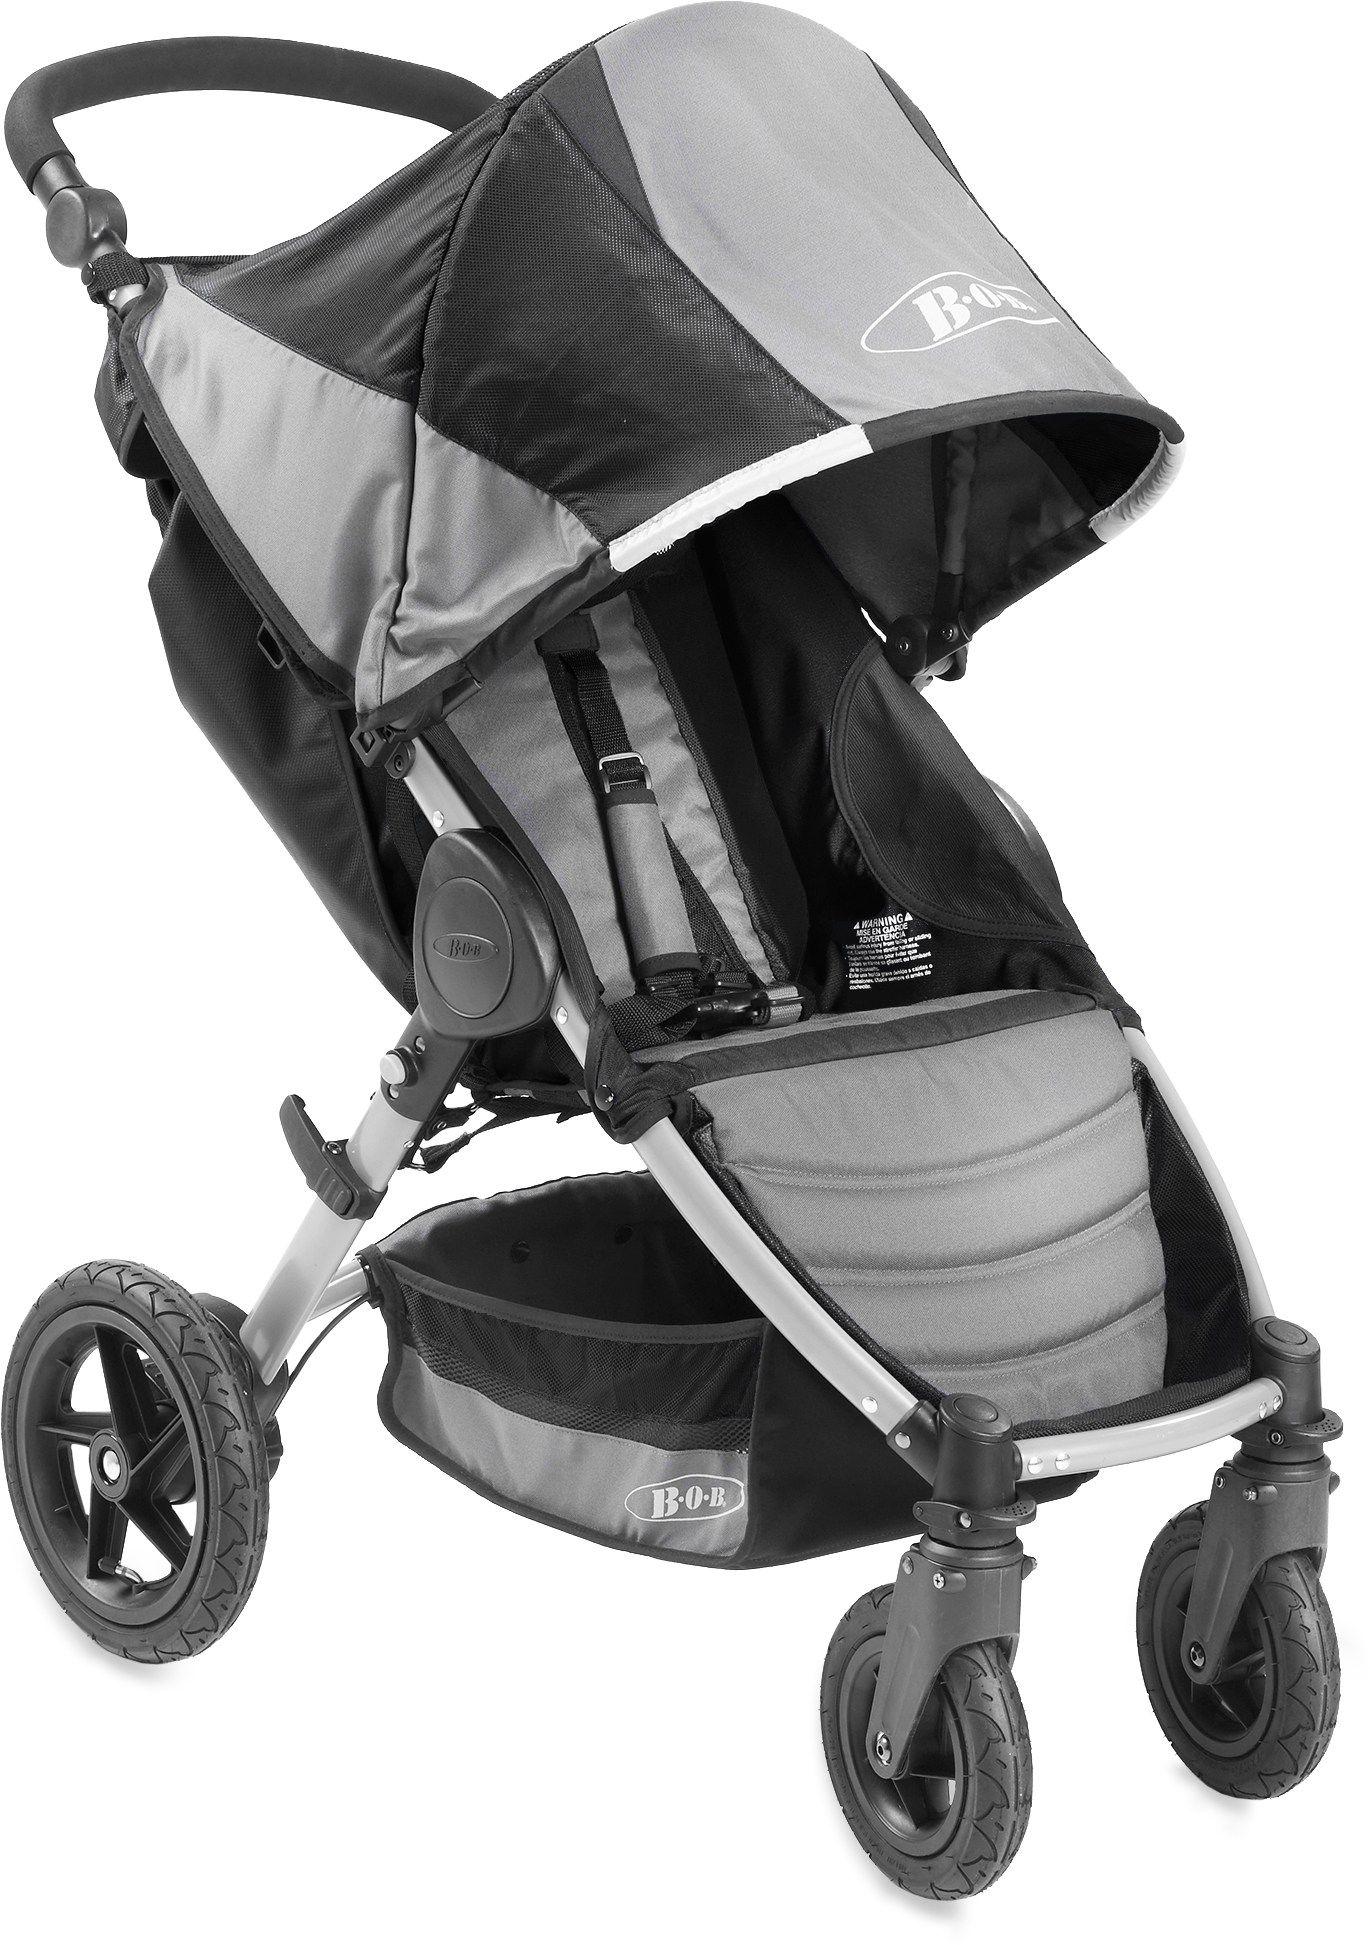 BOB Motion Stroller REI Coop Baby strollers, Bob